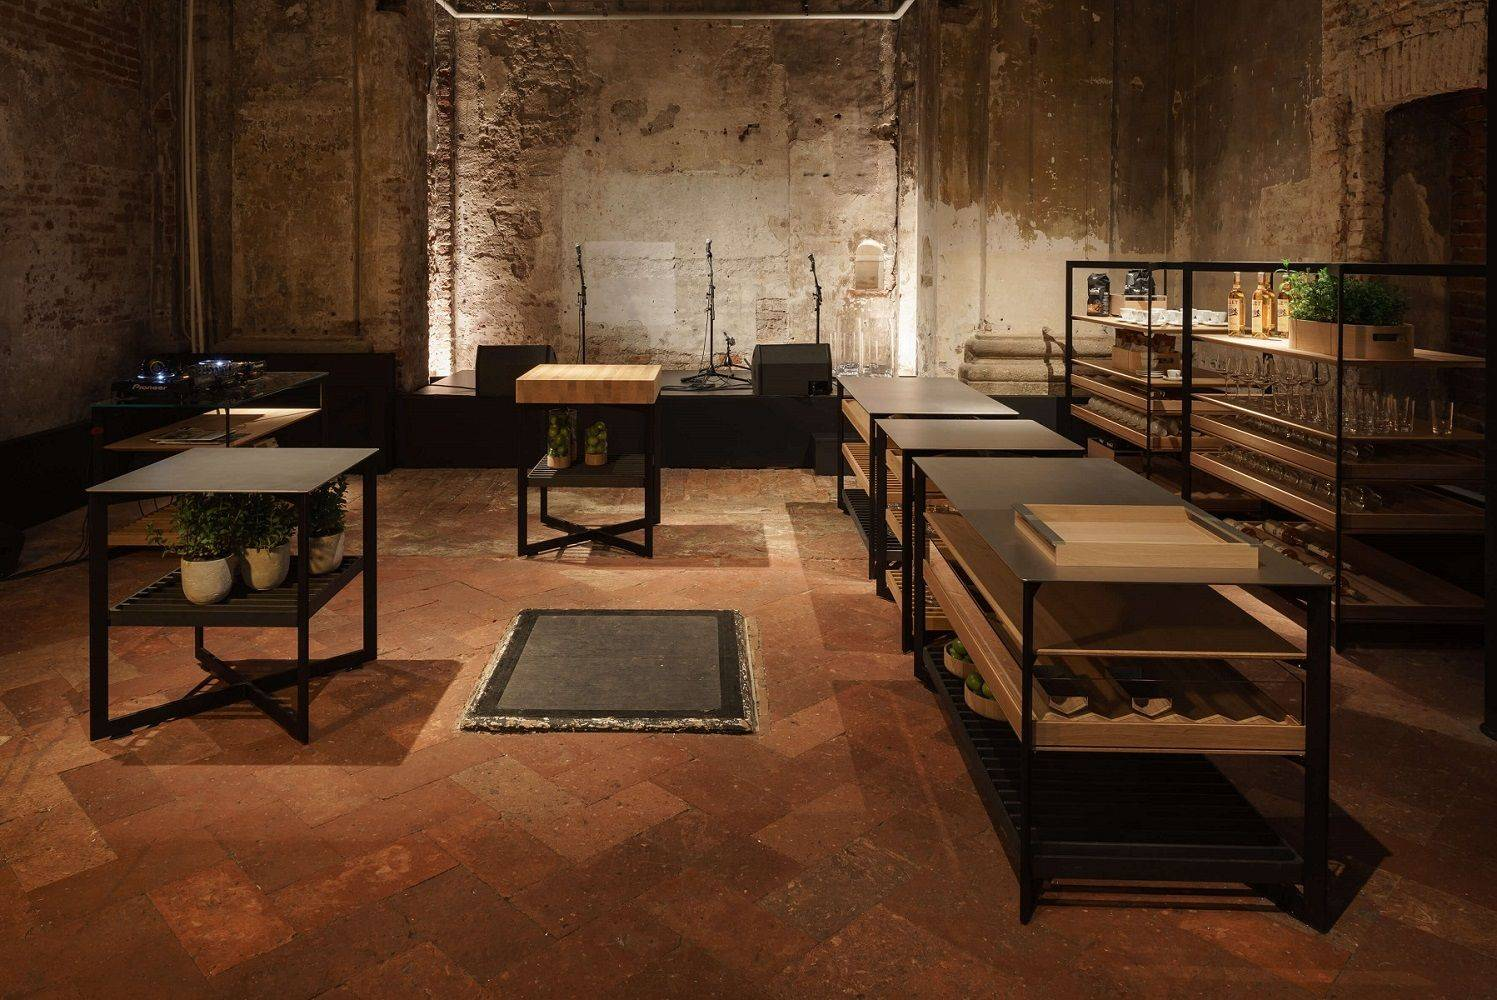 nuovo bulthaup b e i solitari. Black Bedroom Furniture Sets. Home Design Ideas